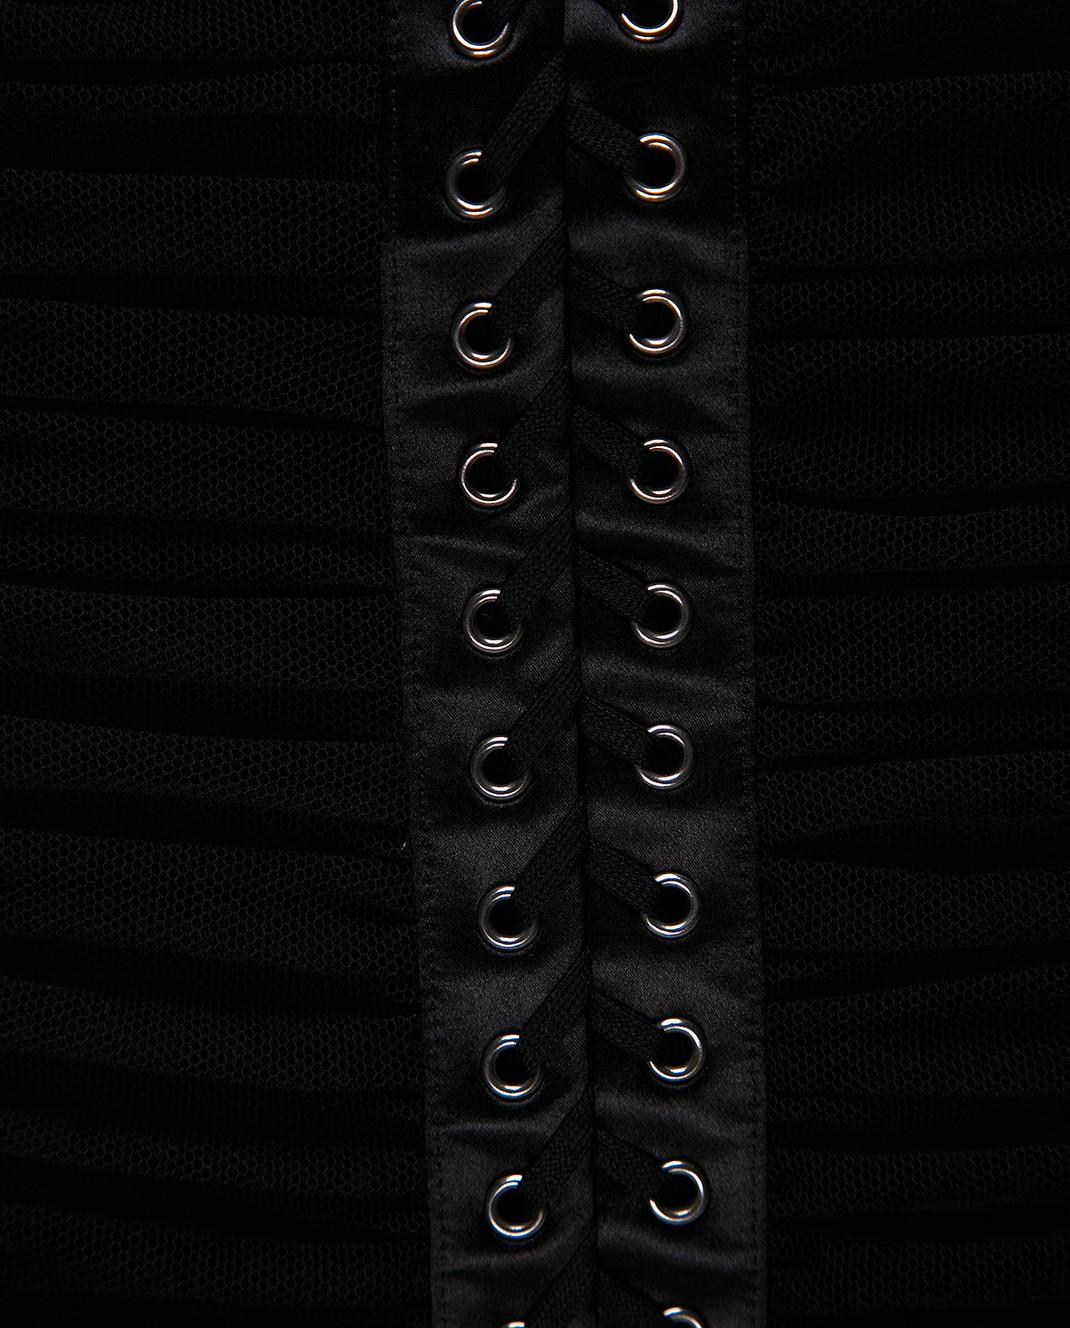 Dolce&Gabbana Черное платье F6A9QTFLEAA изображение 5